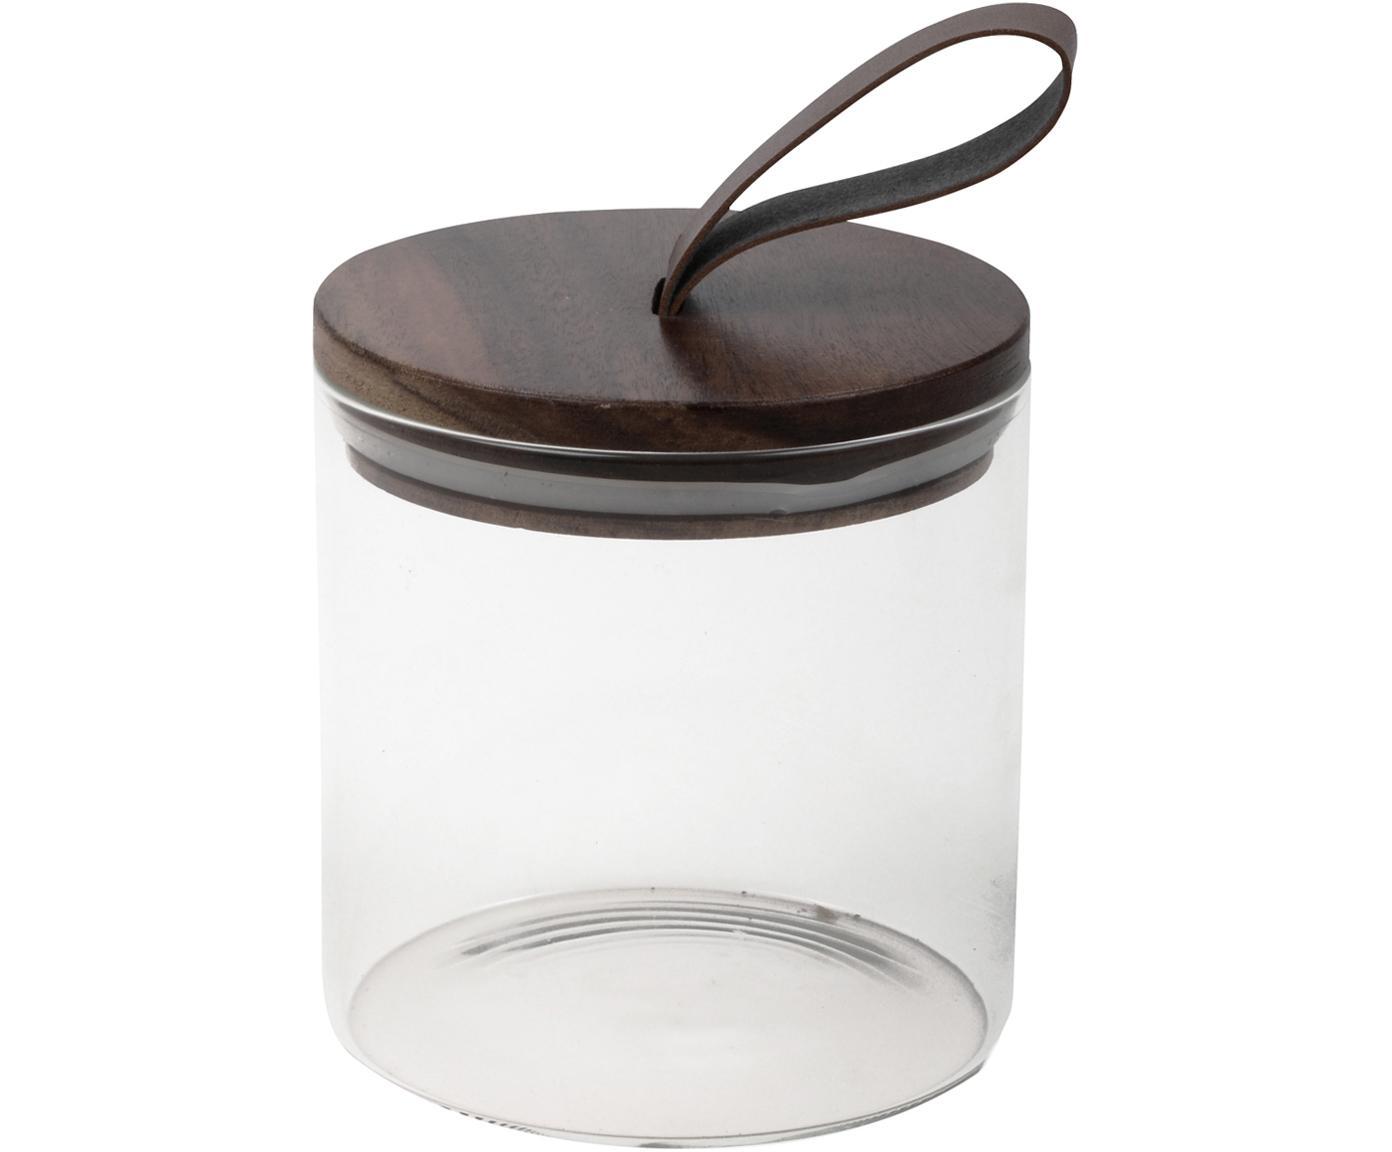 Aufbewahrungsglas Bory, Dose: Borosilikatglas Deckel, Transparent, Braun, Ø 10 x H 12 cm